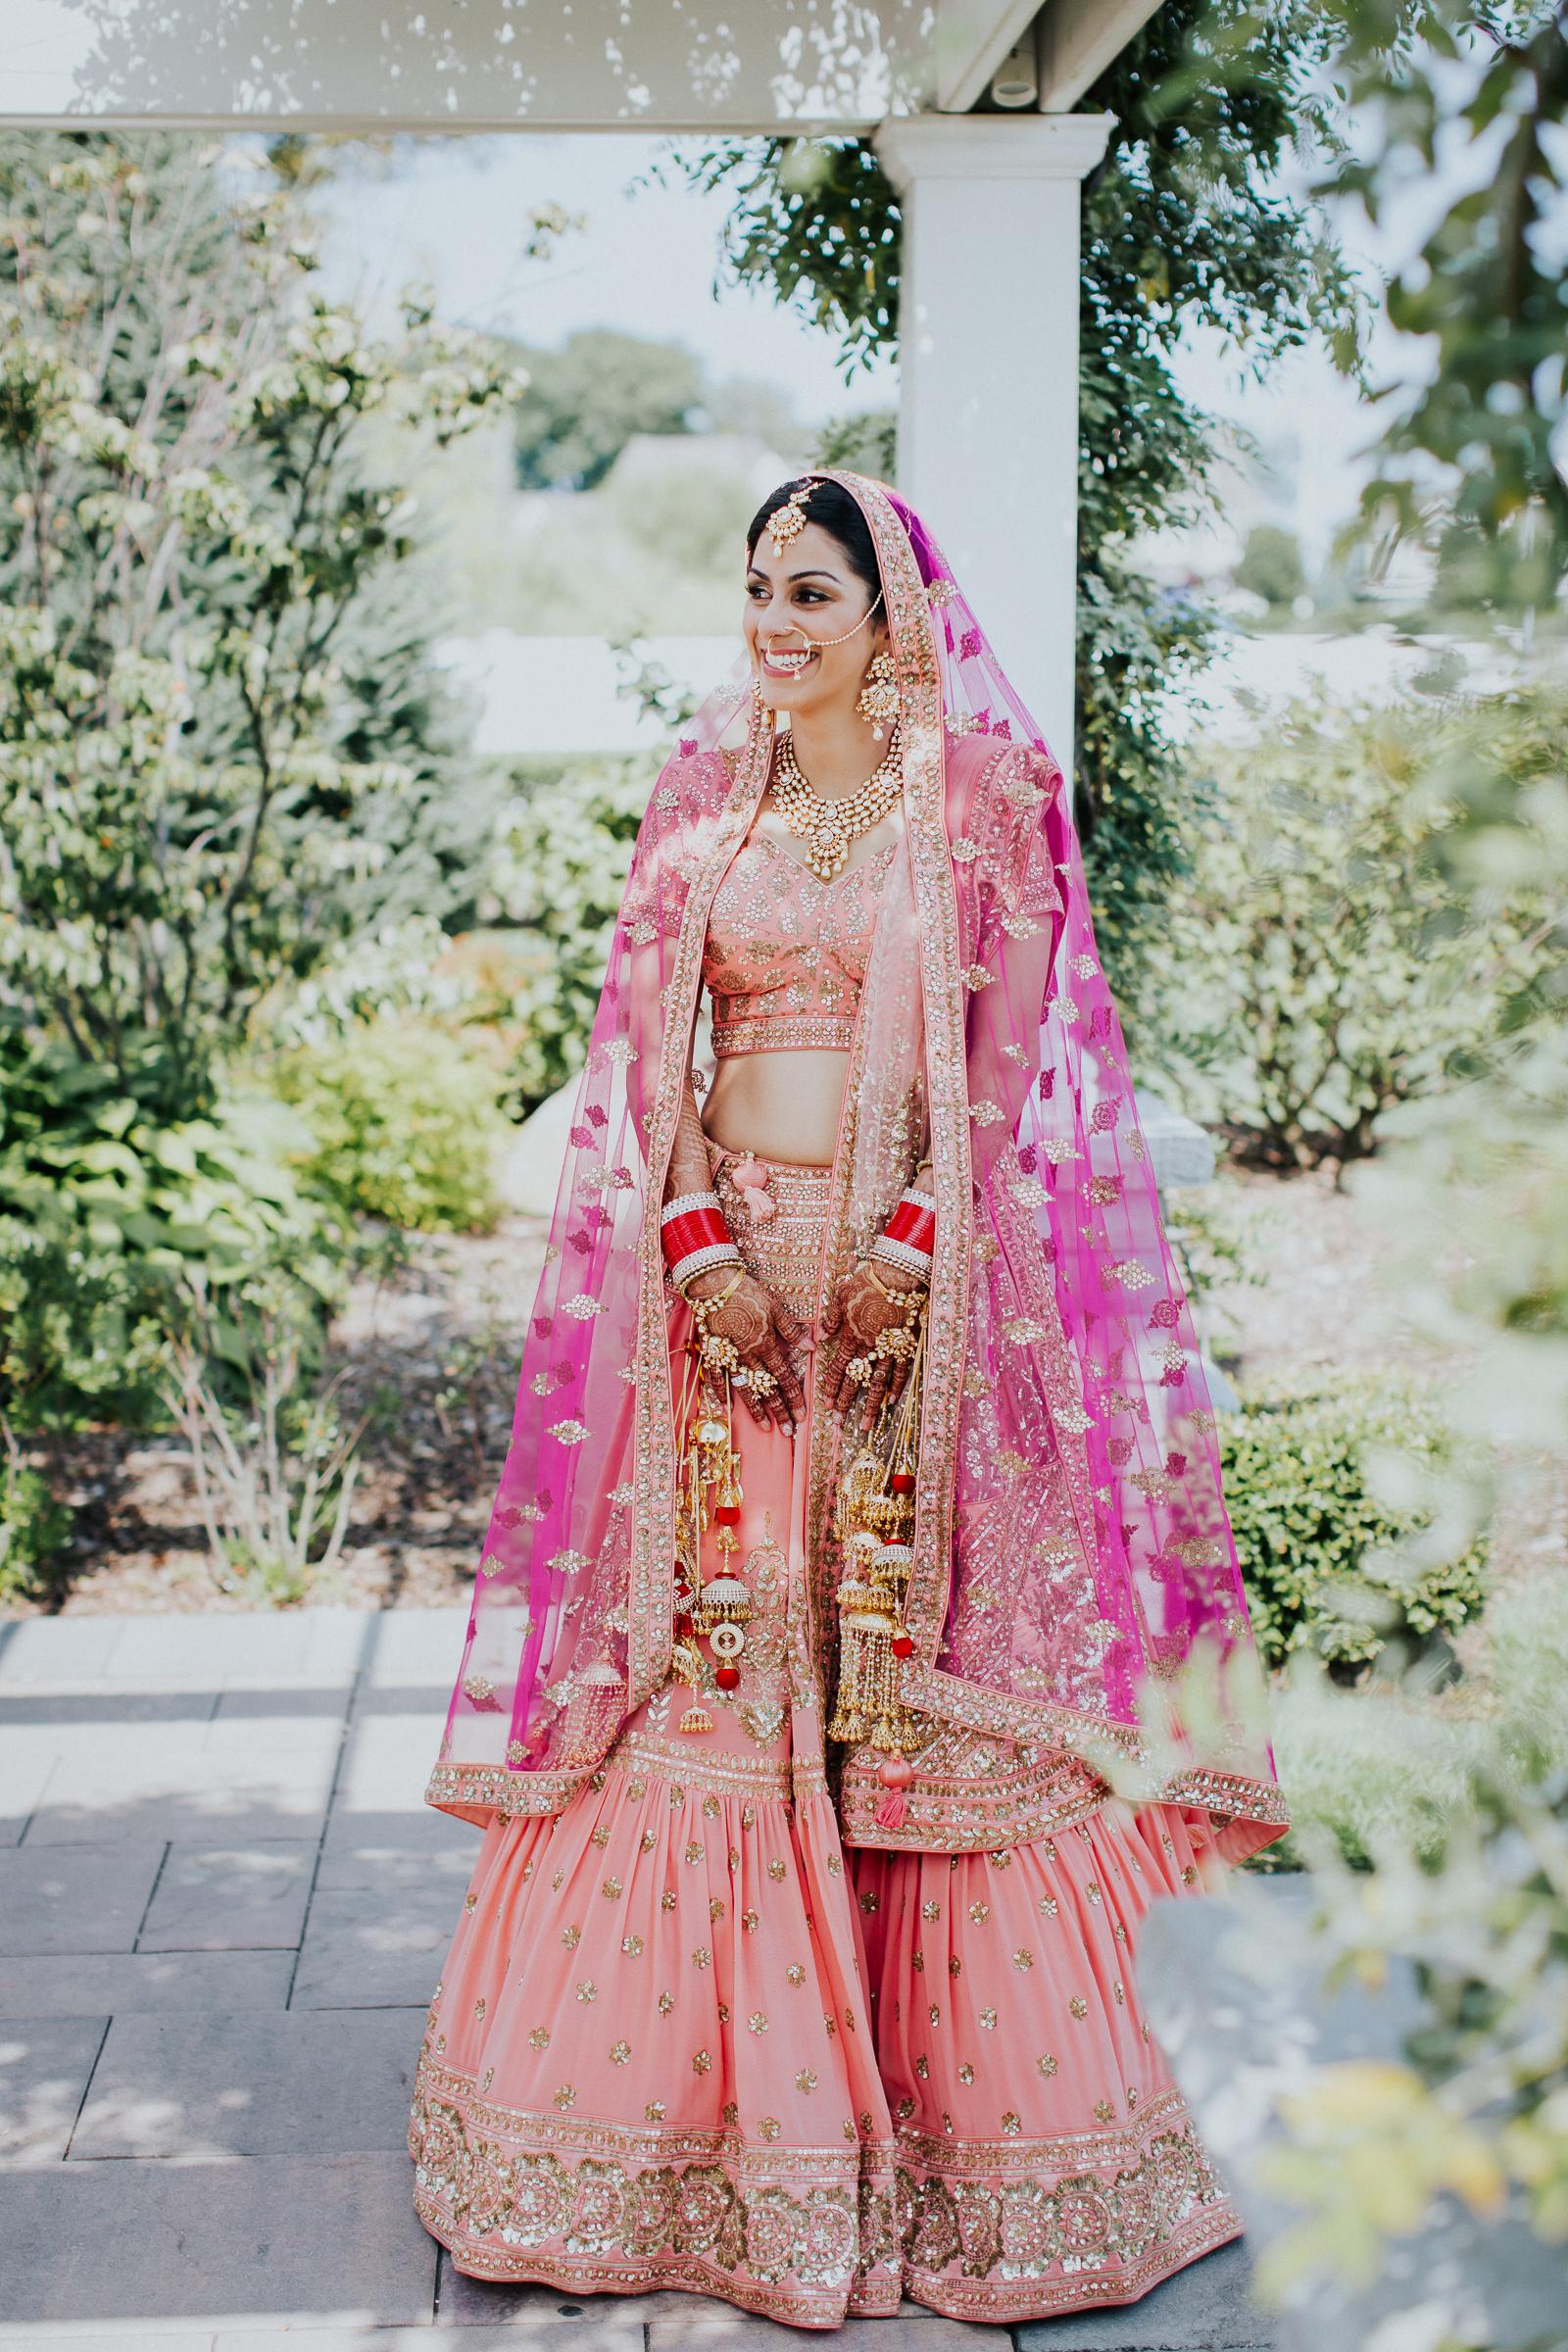 Nadiya-Sherief-Green-Tree-Country-Club-Indian-New-York-Documentary-Wedding-Photographer-34.jpg